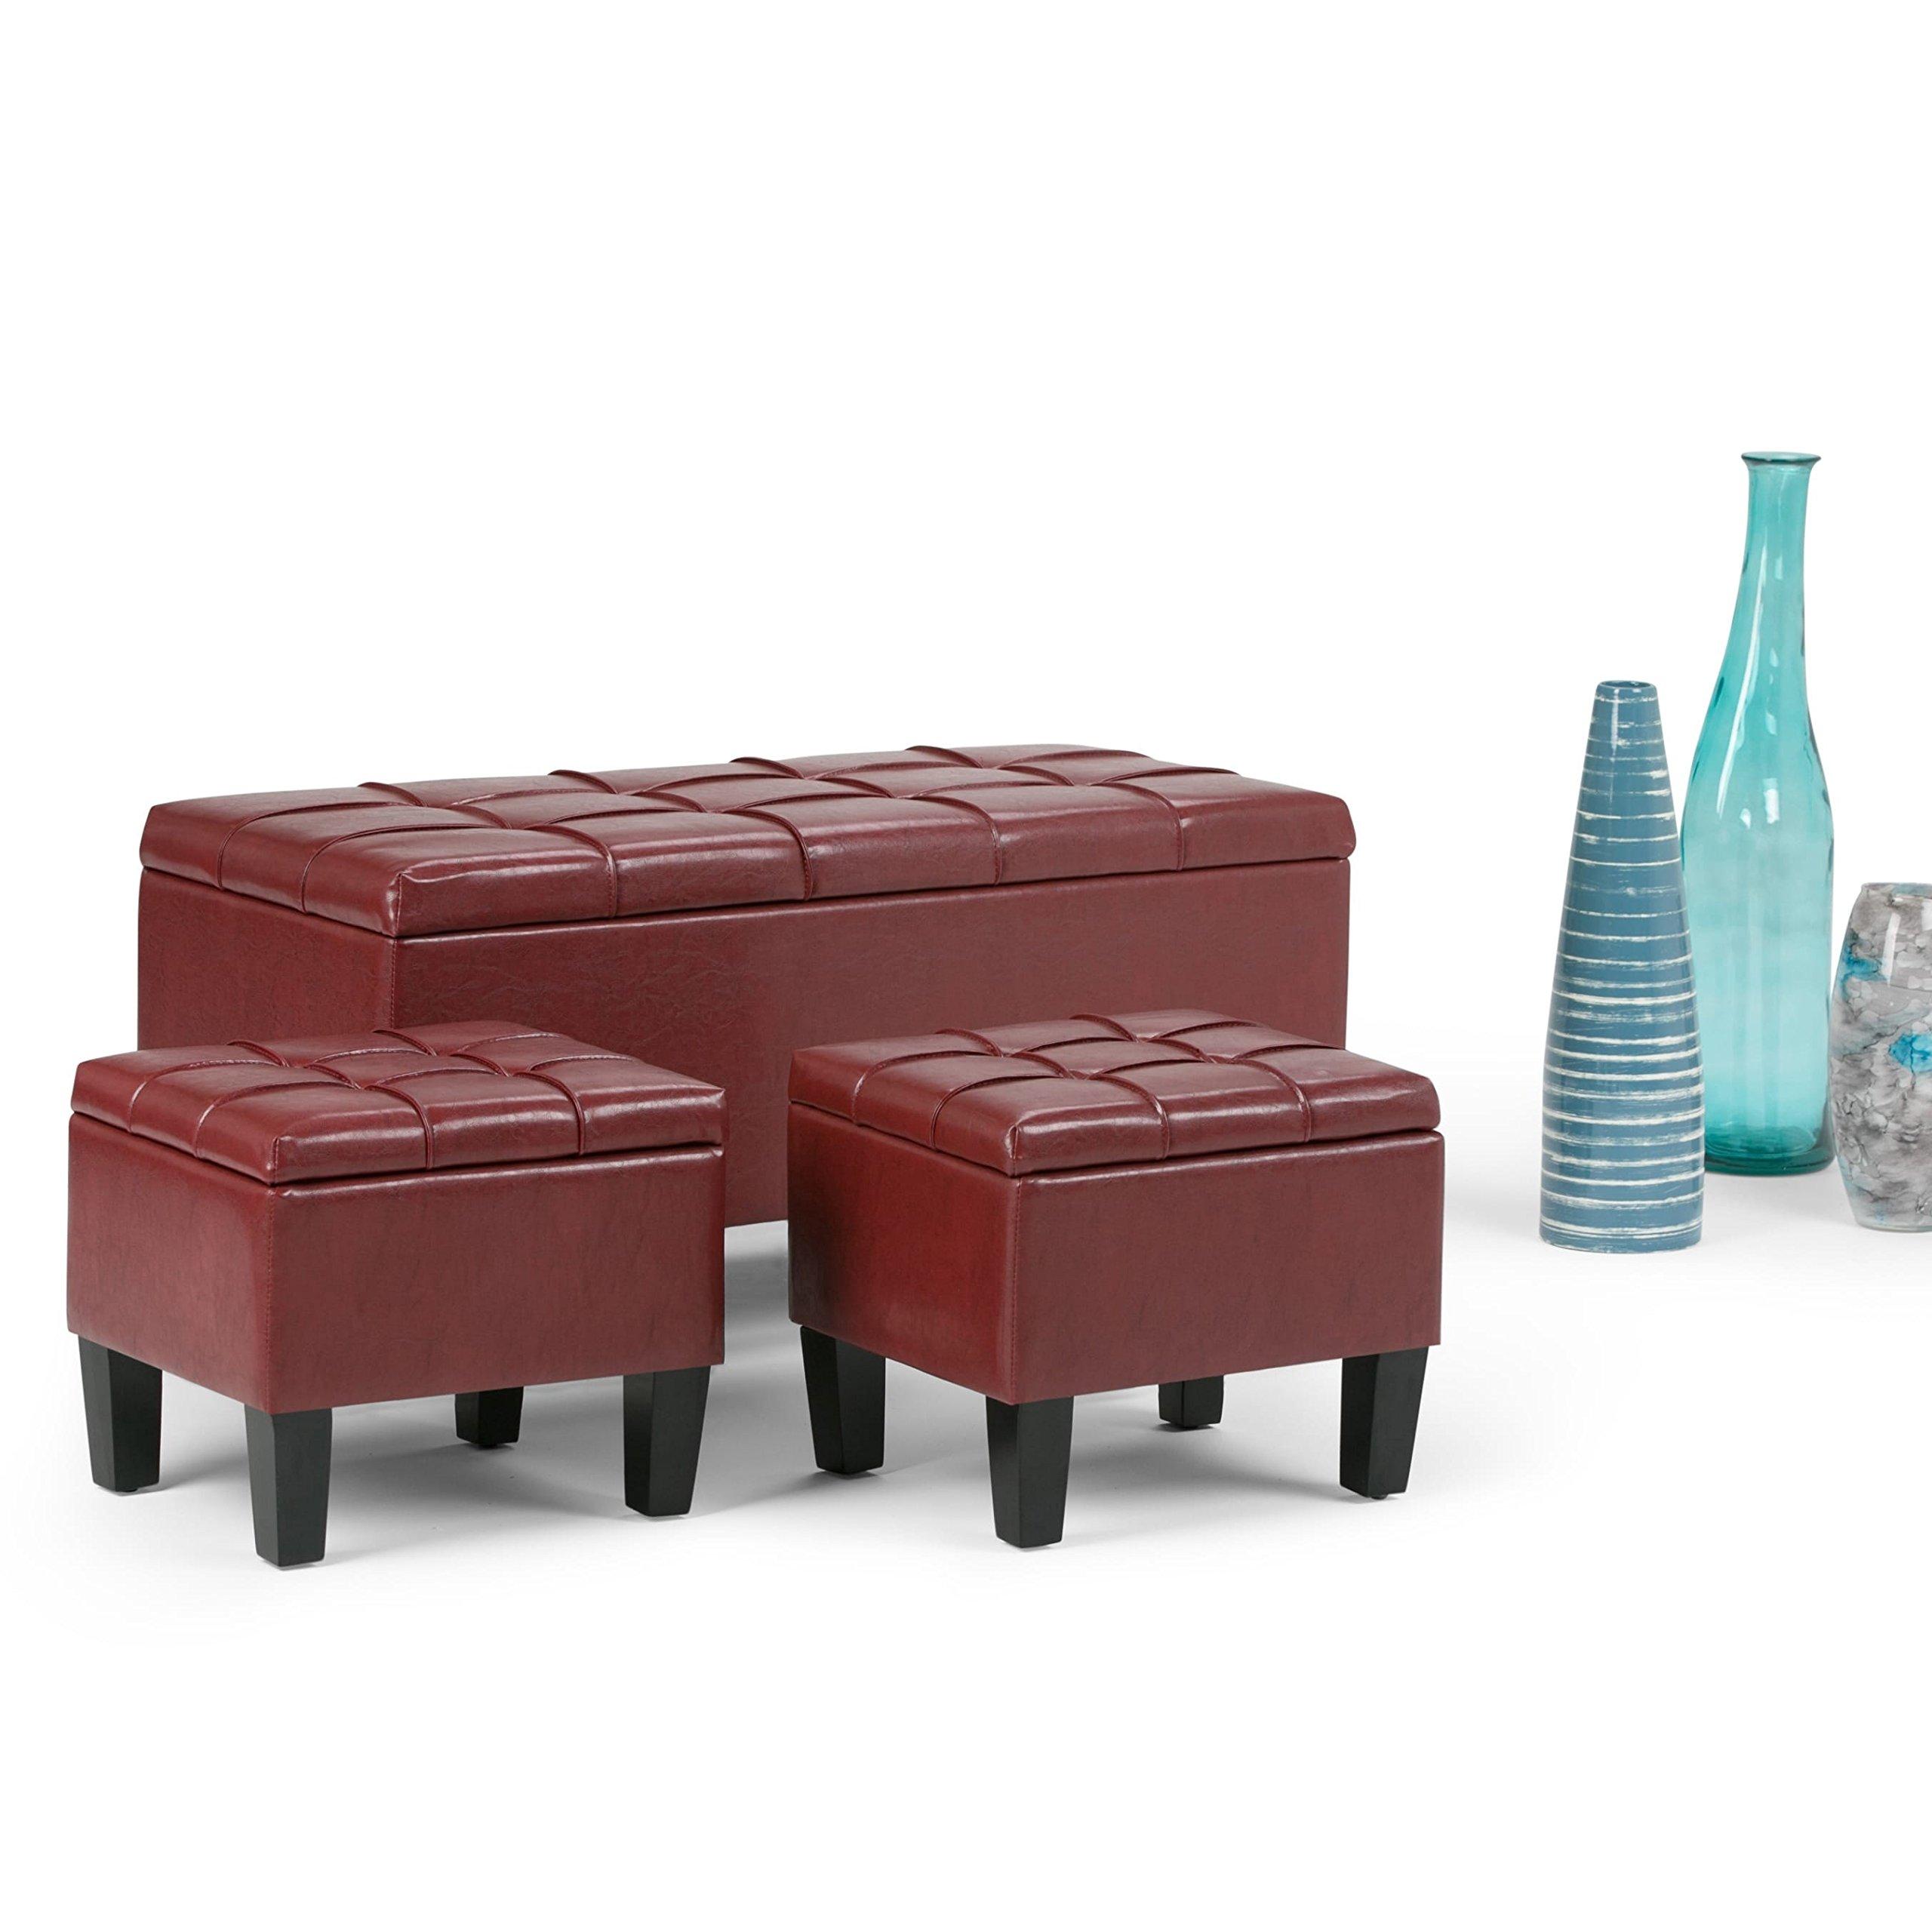 WyndenHall Lancaster 3-piece Storage Ottoman Set (Set of 3) Red Faux Leather, Wood, Foam